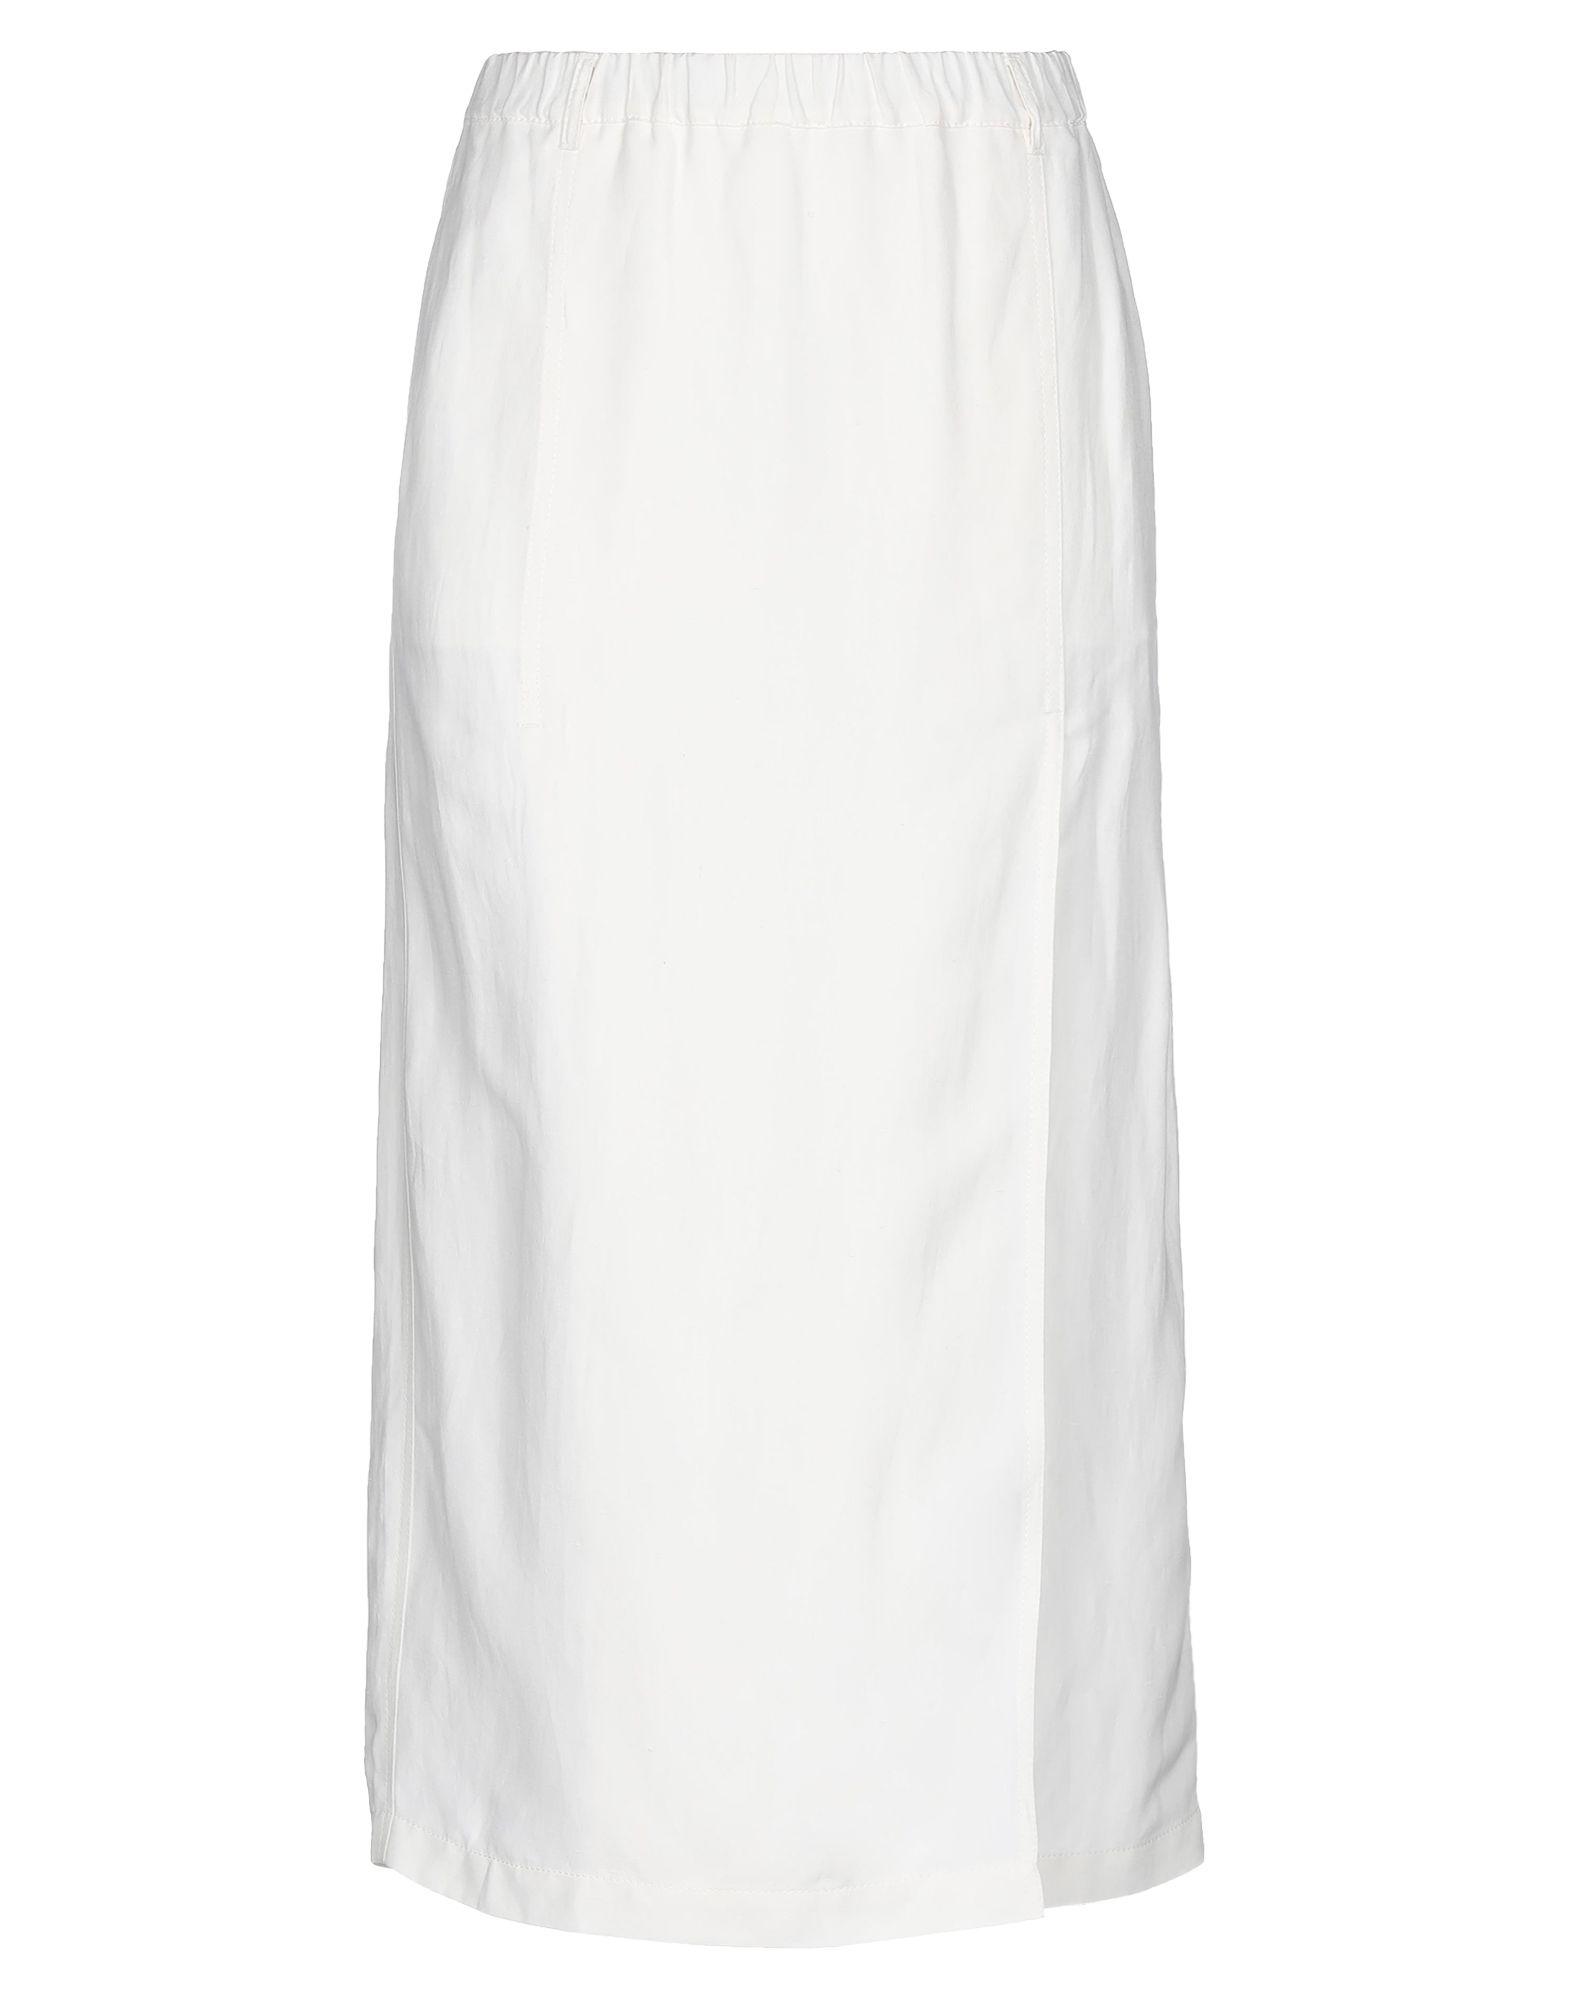 ASPESI Юбка длиной 3/4 aspesi рубашка с рукавами 3 4